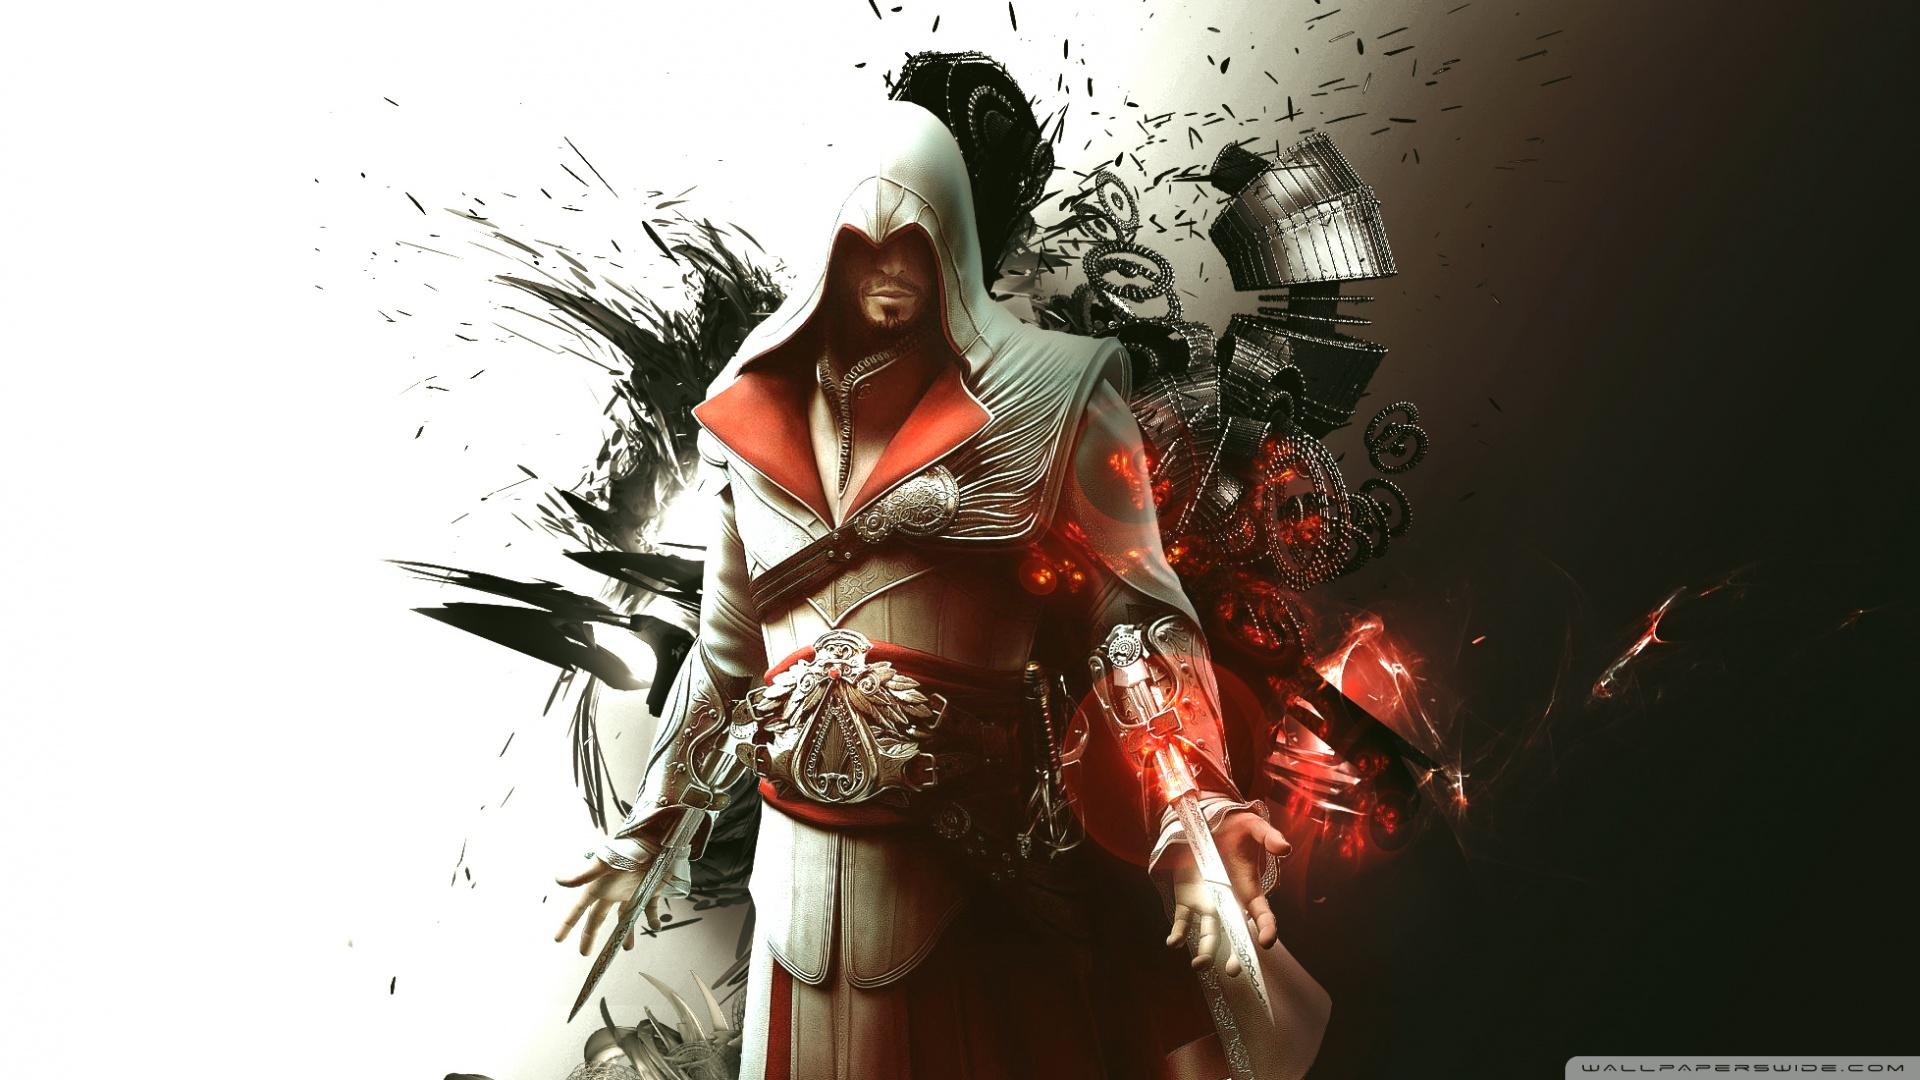 Assassins Creed 3 Brotherhood Wallpaper 1920x1080 Assassins Creed 3 1920x1080